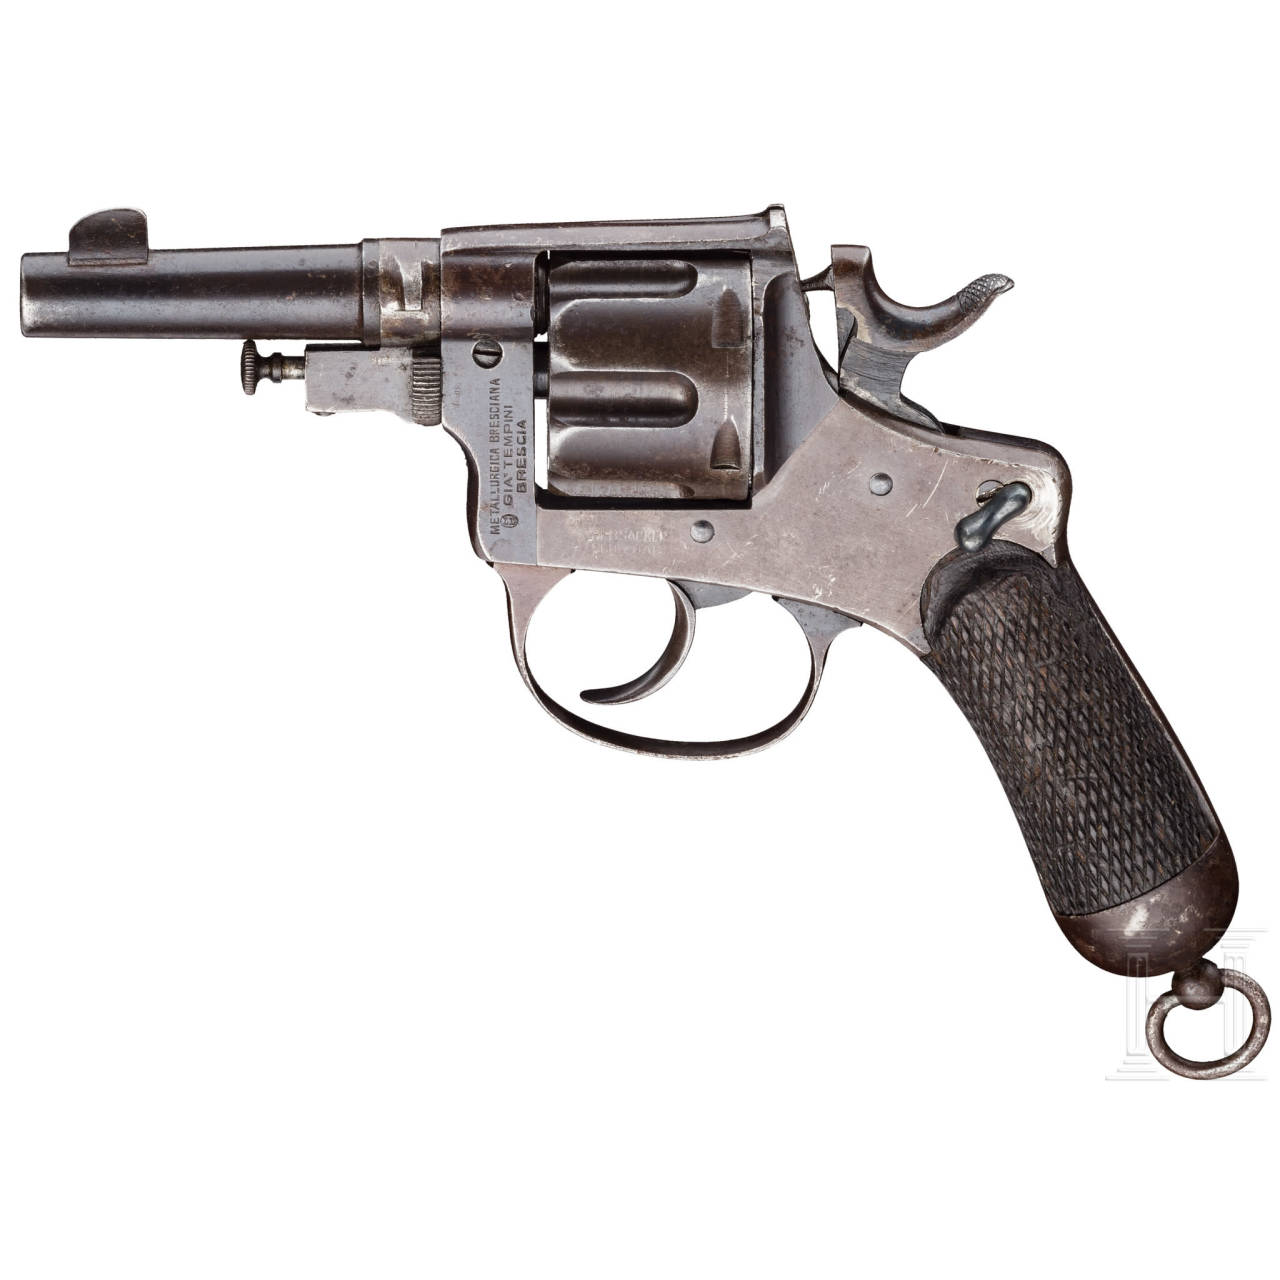 Glisenti-Bodeo Mod. 1889/1922, mit Tasche